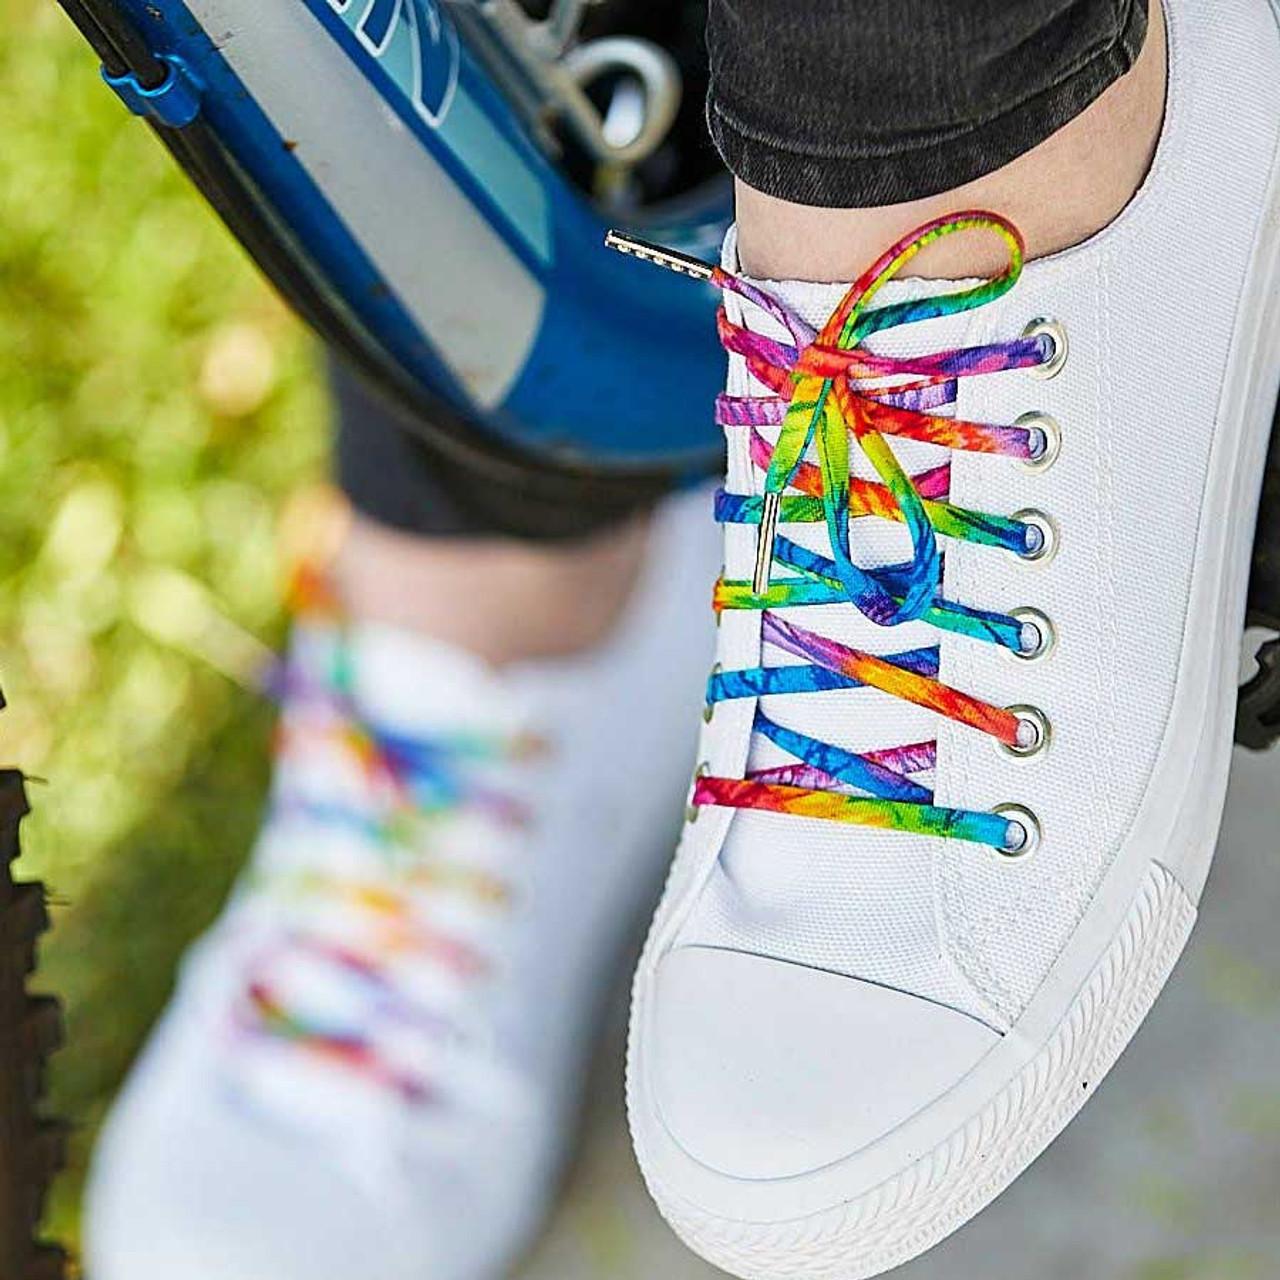 Tie Dye Shoelaces   Buy Online